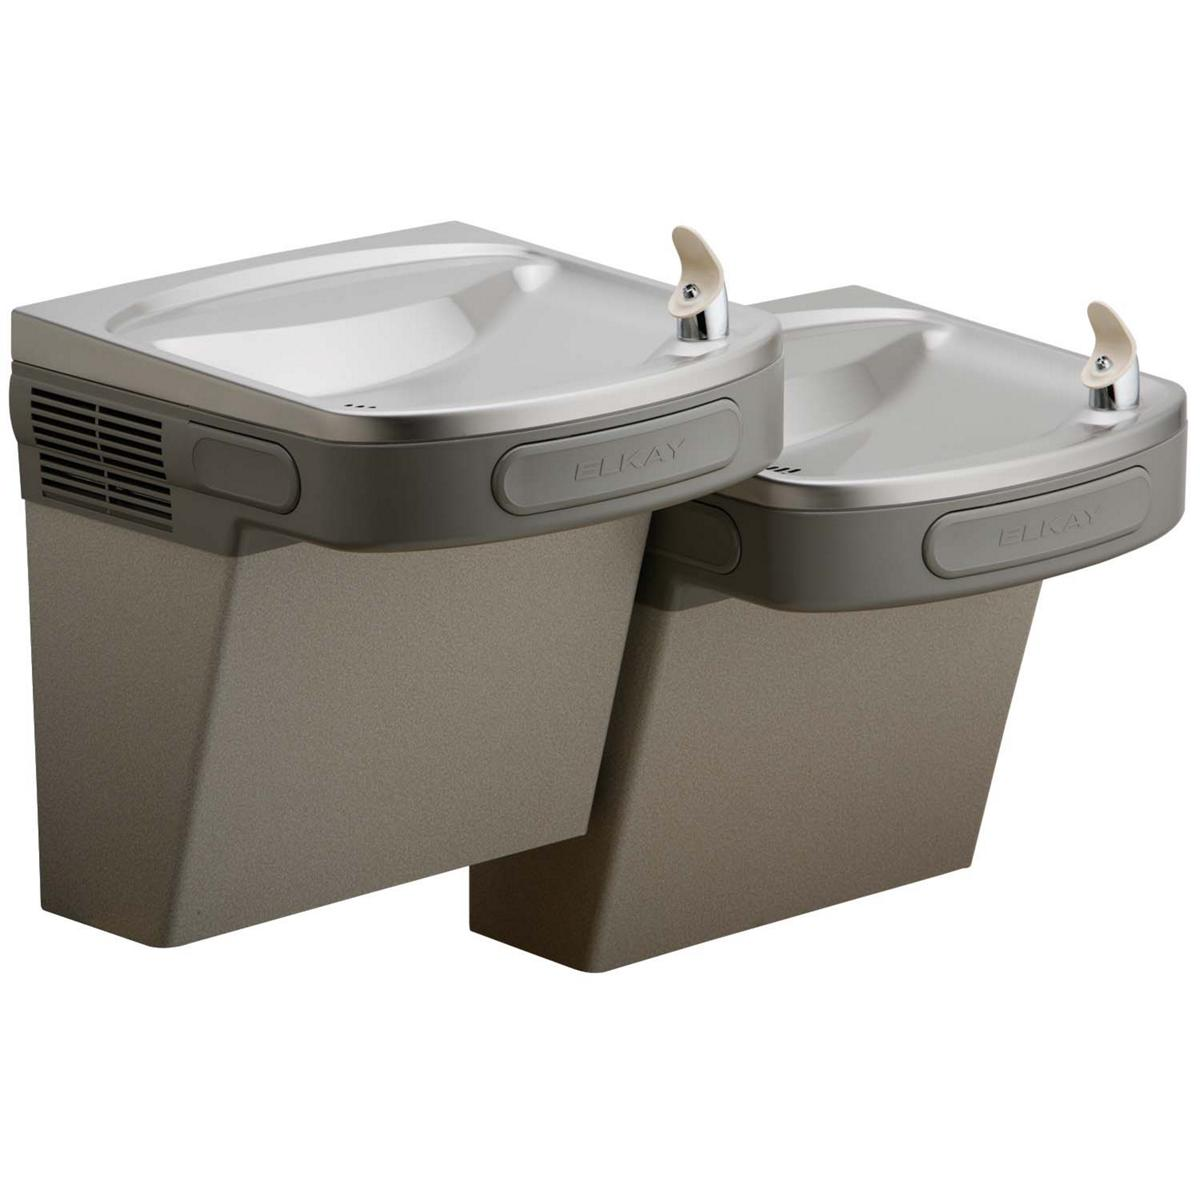 Elkay Versatile Cooler Wall Mount Bi-level ADA Non-filtered, Non-refrigerated Light Gray Granite 1259909